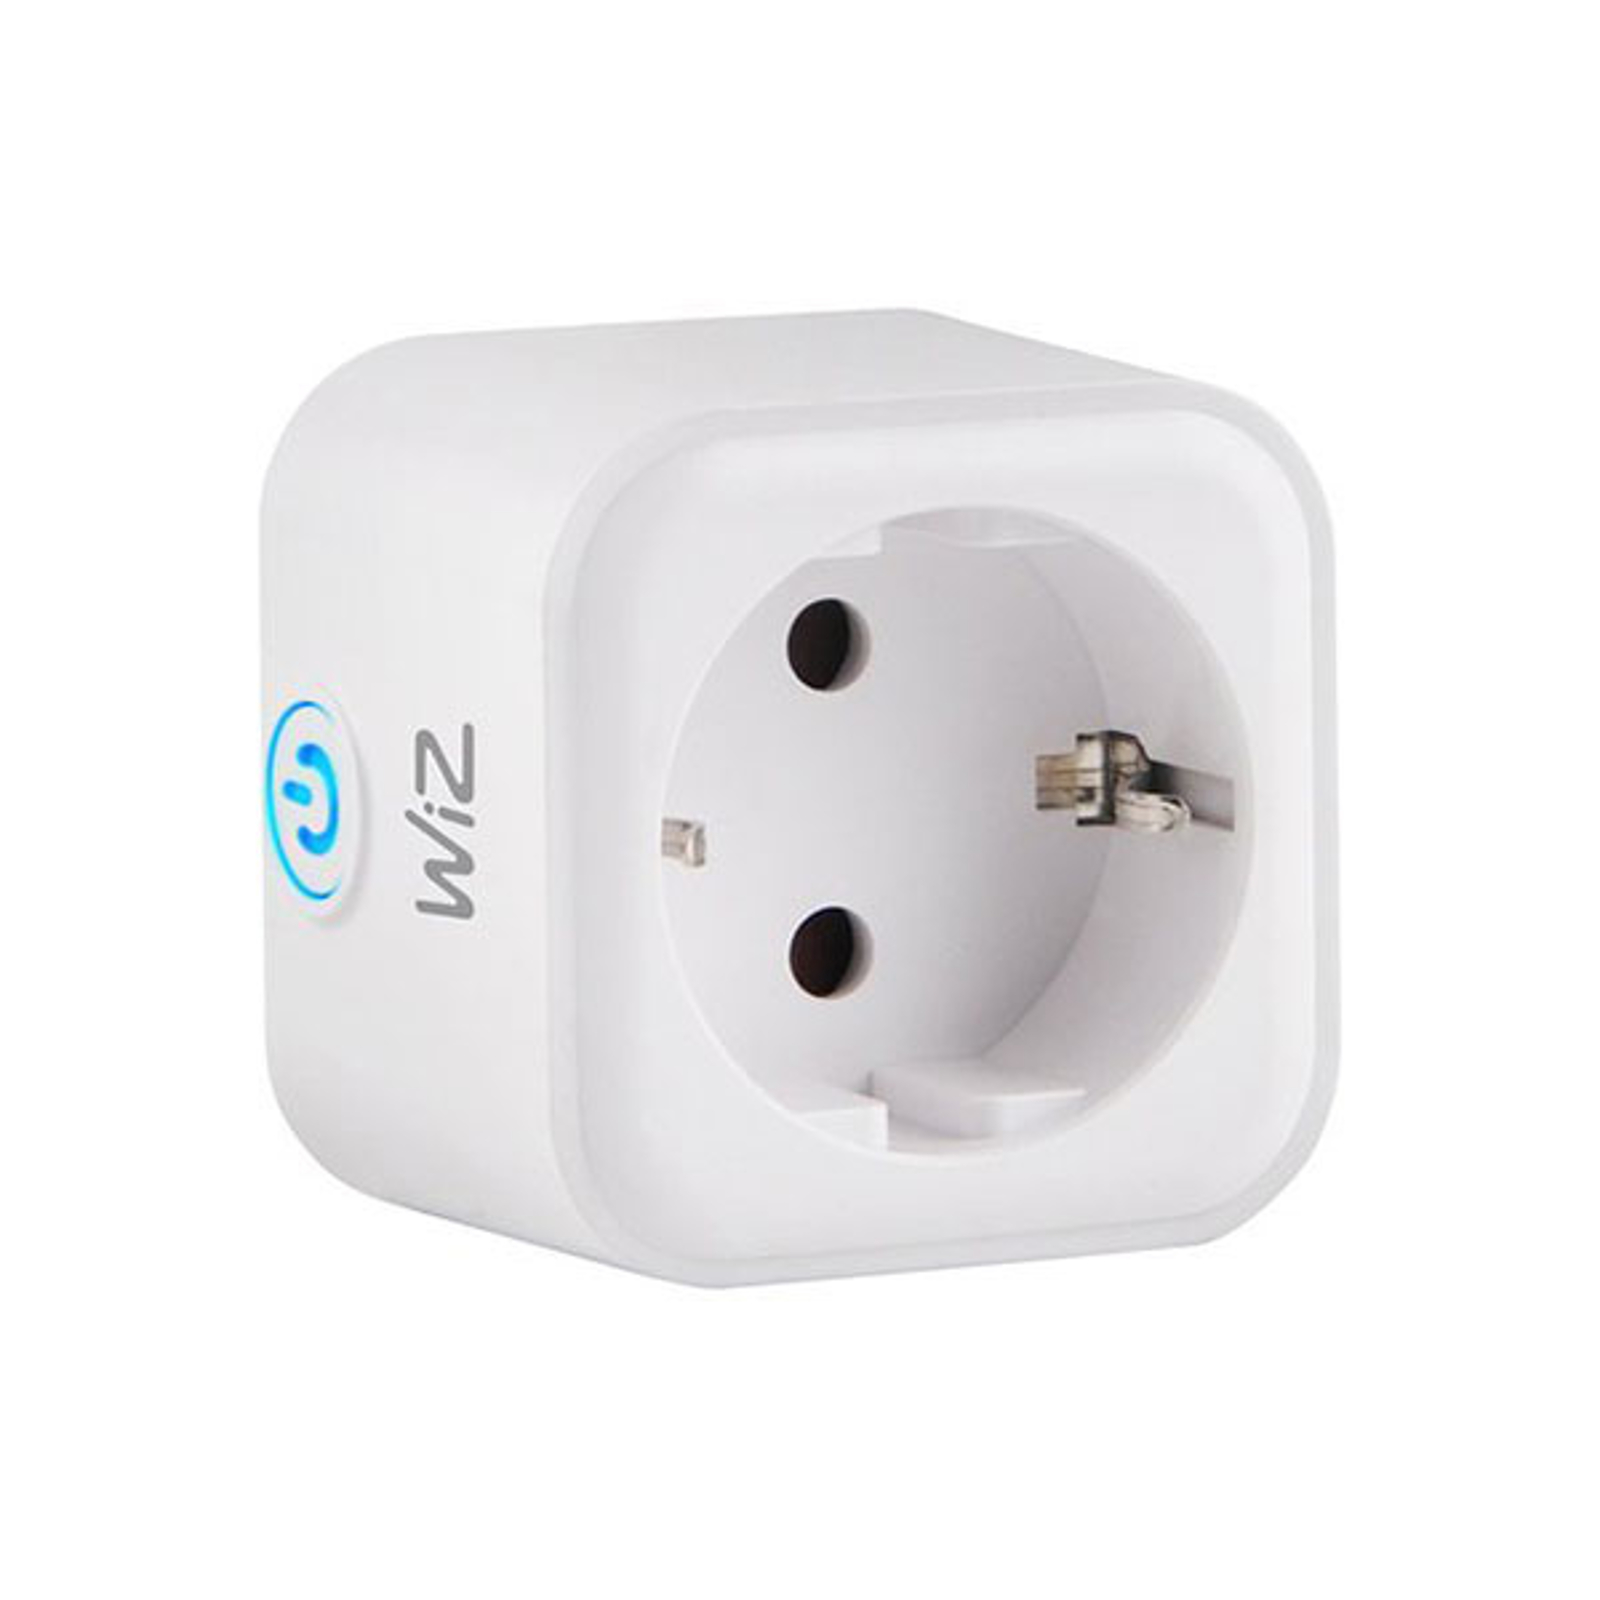 WiZ Smart Plug uttag